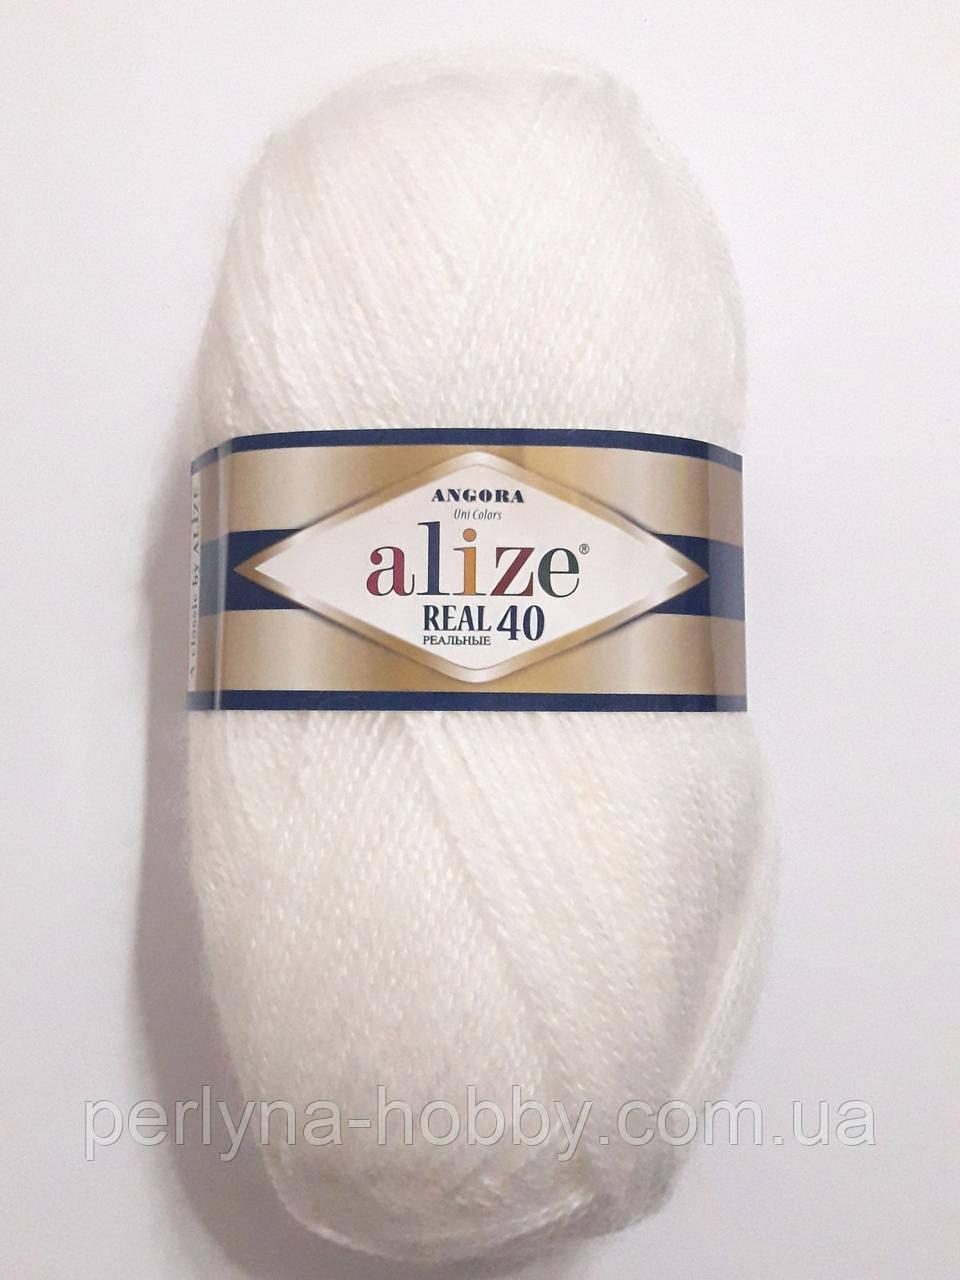 Пряжа ангора Ализе Angora Alize Real 40, 60% акрил 40% шерсть 100 грам, 480 м, біла